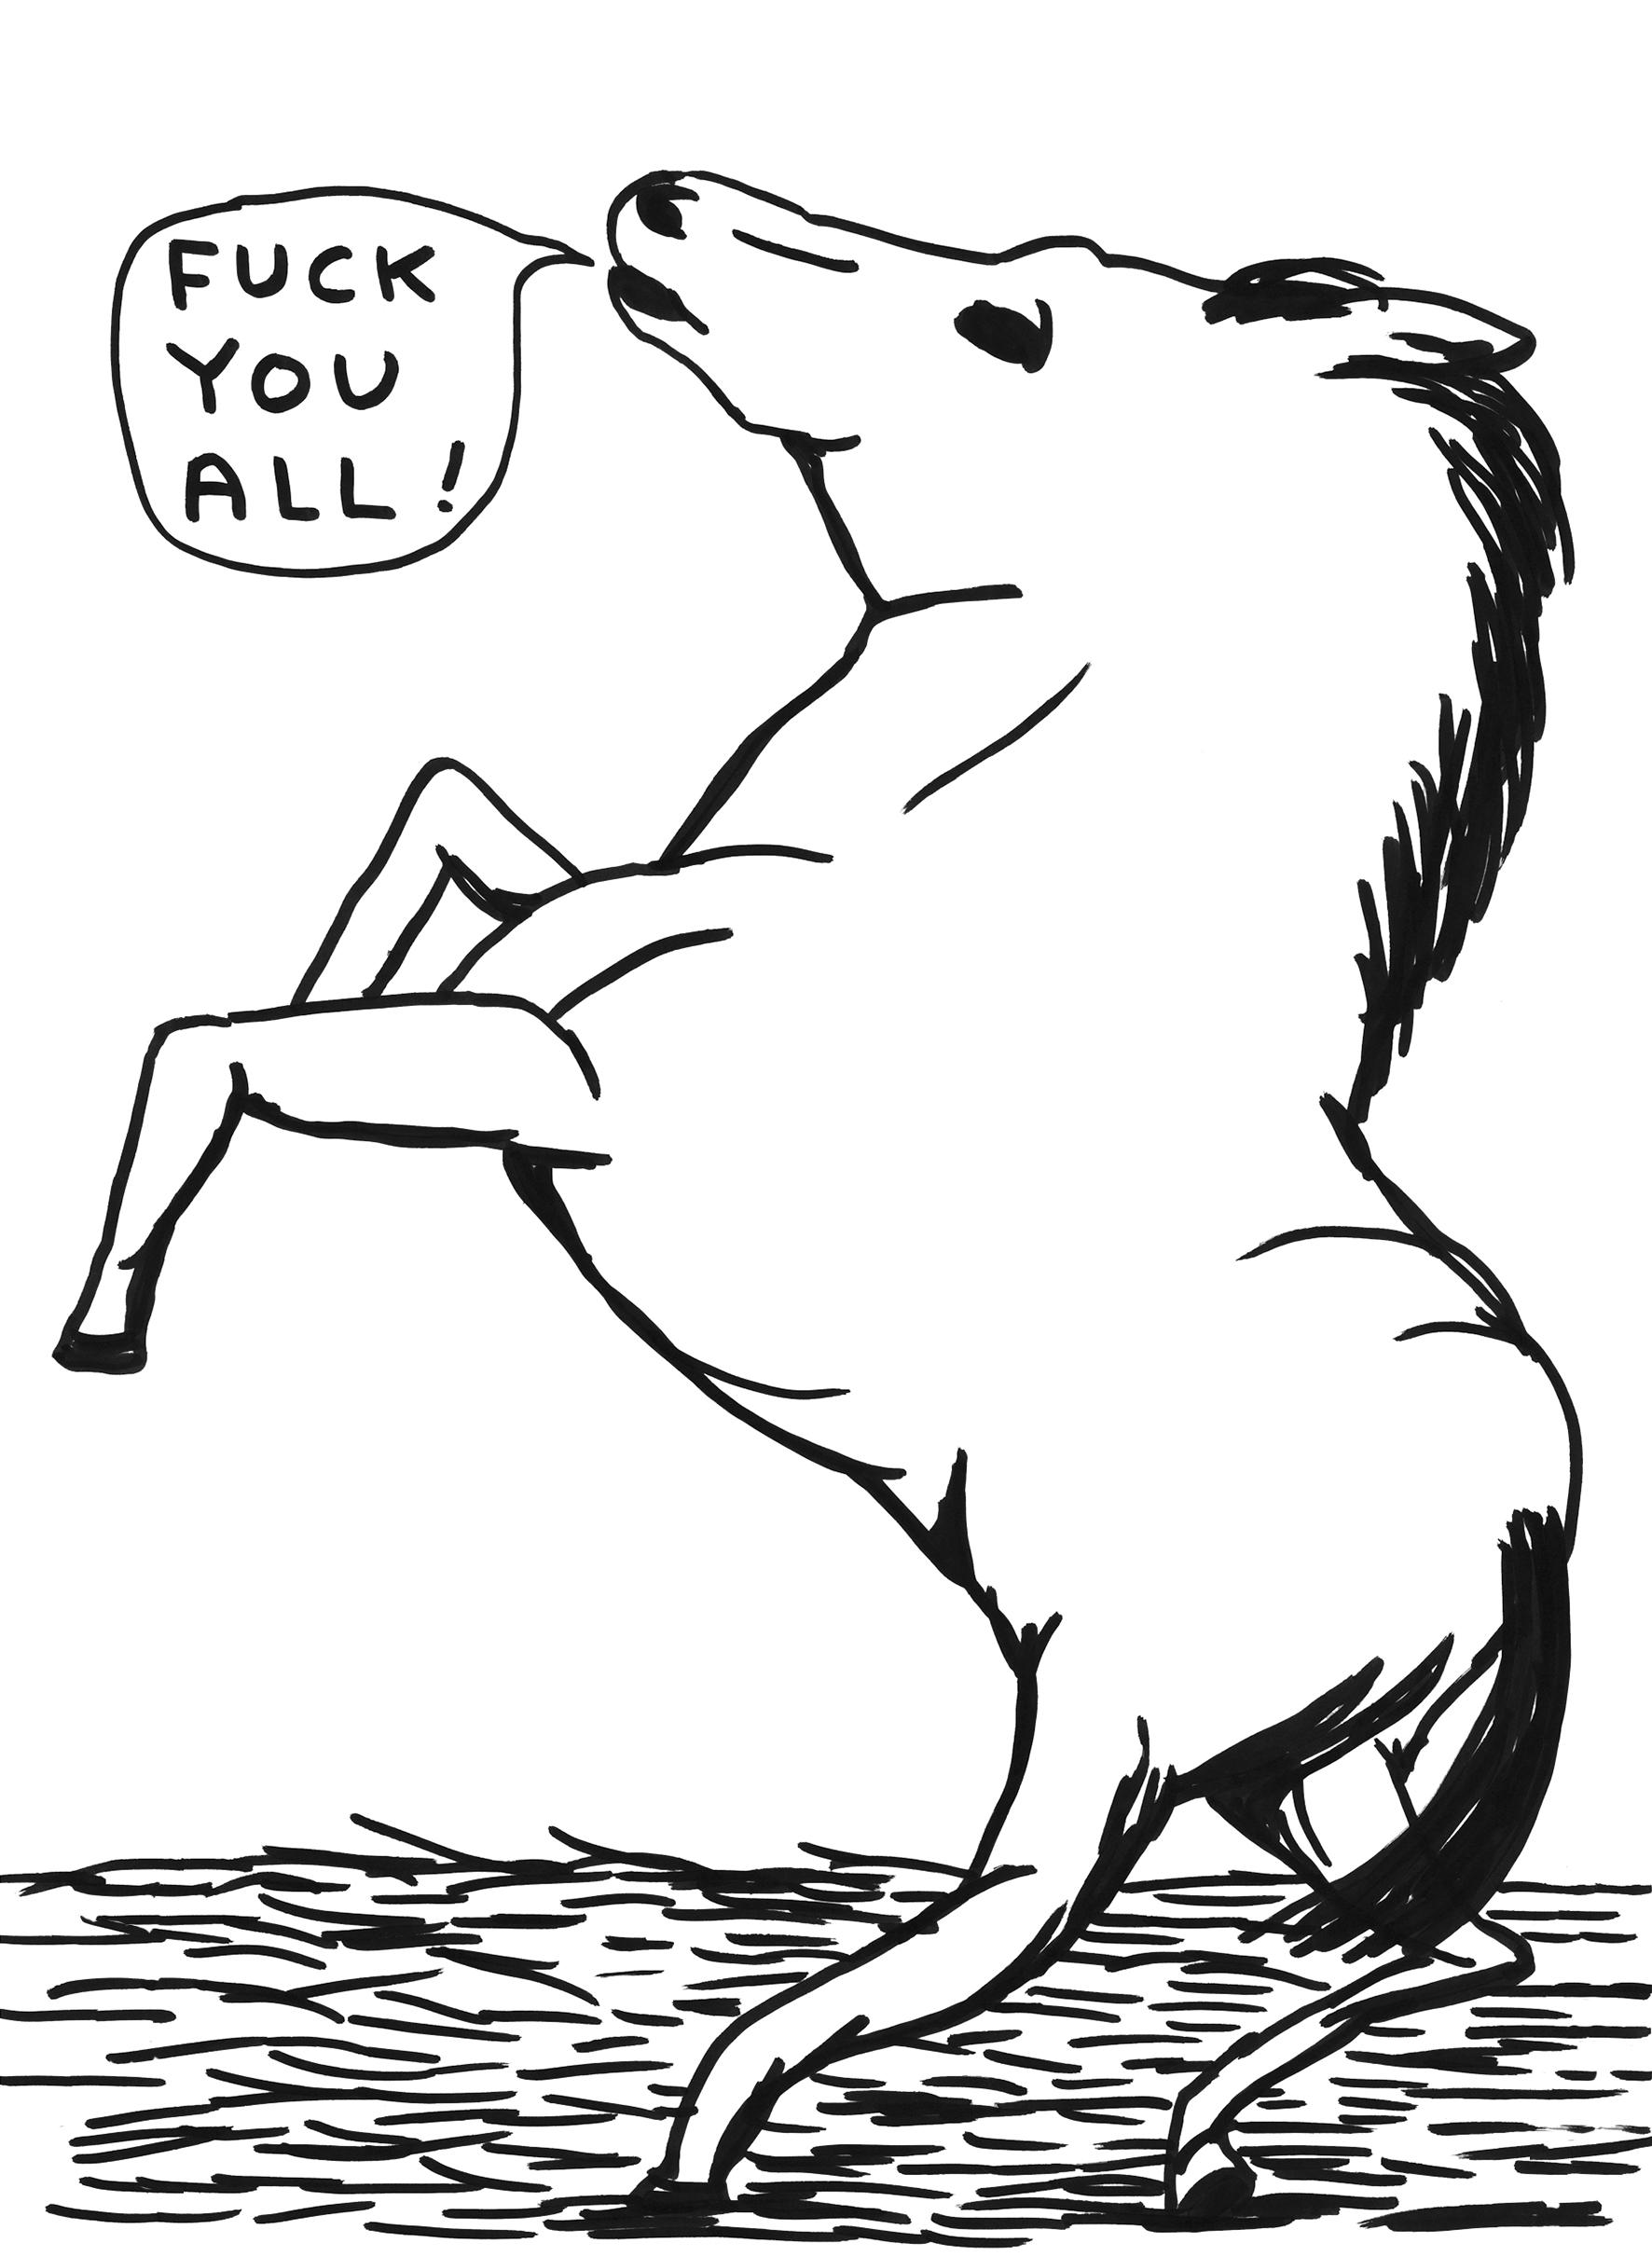 Fuck You All, by David Shrigley